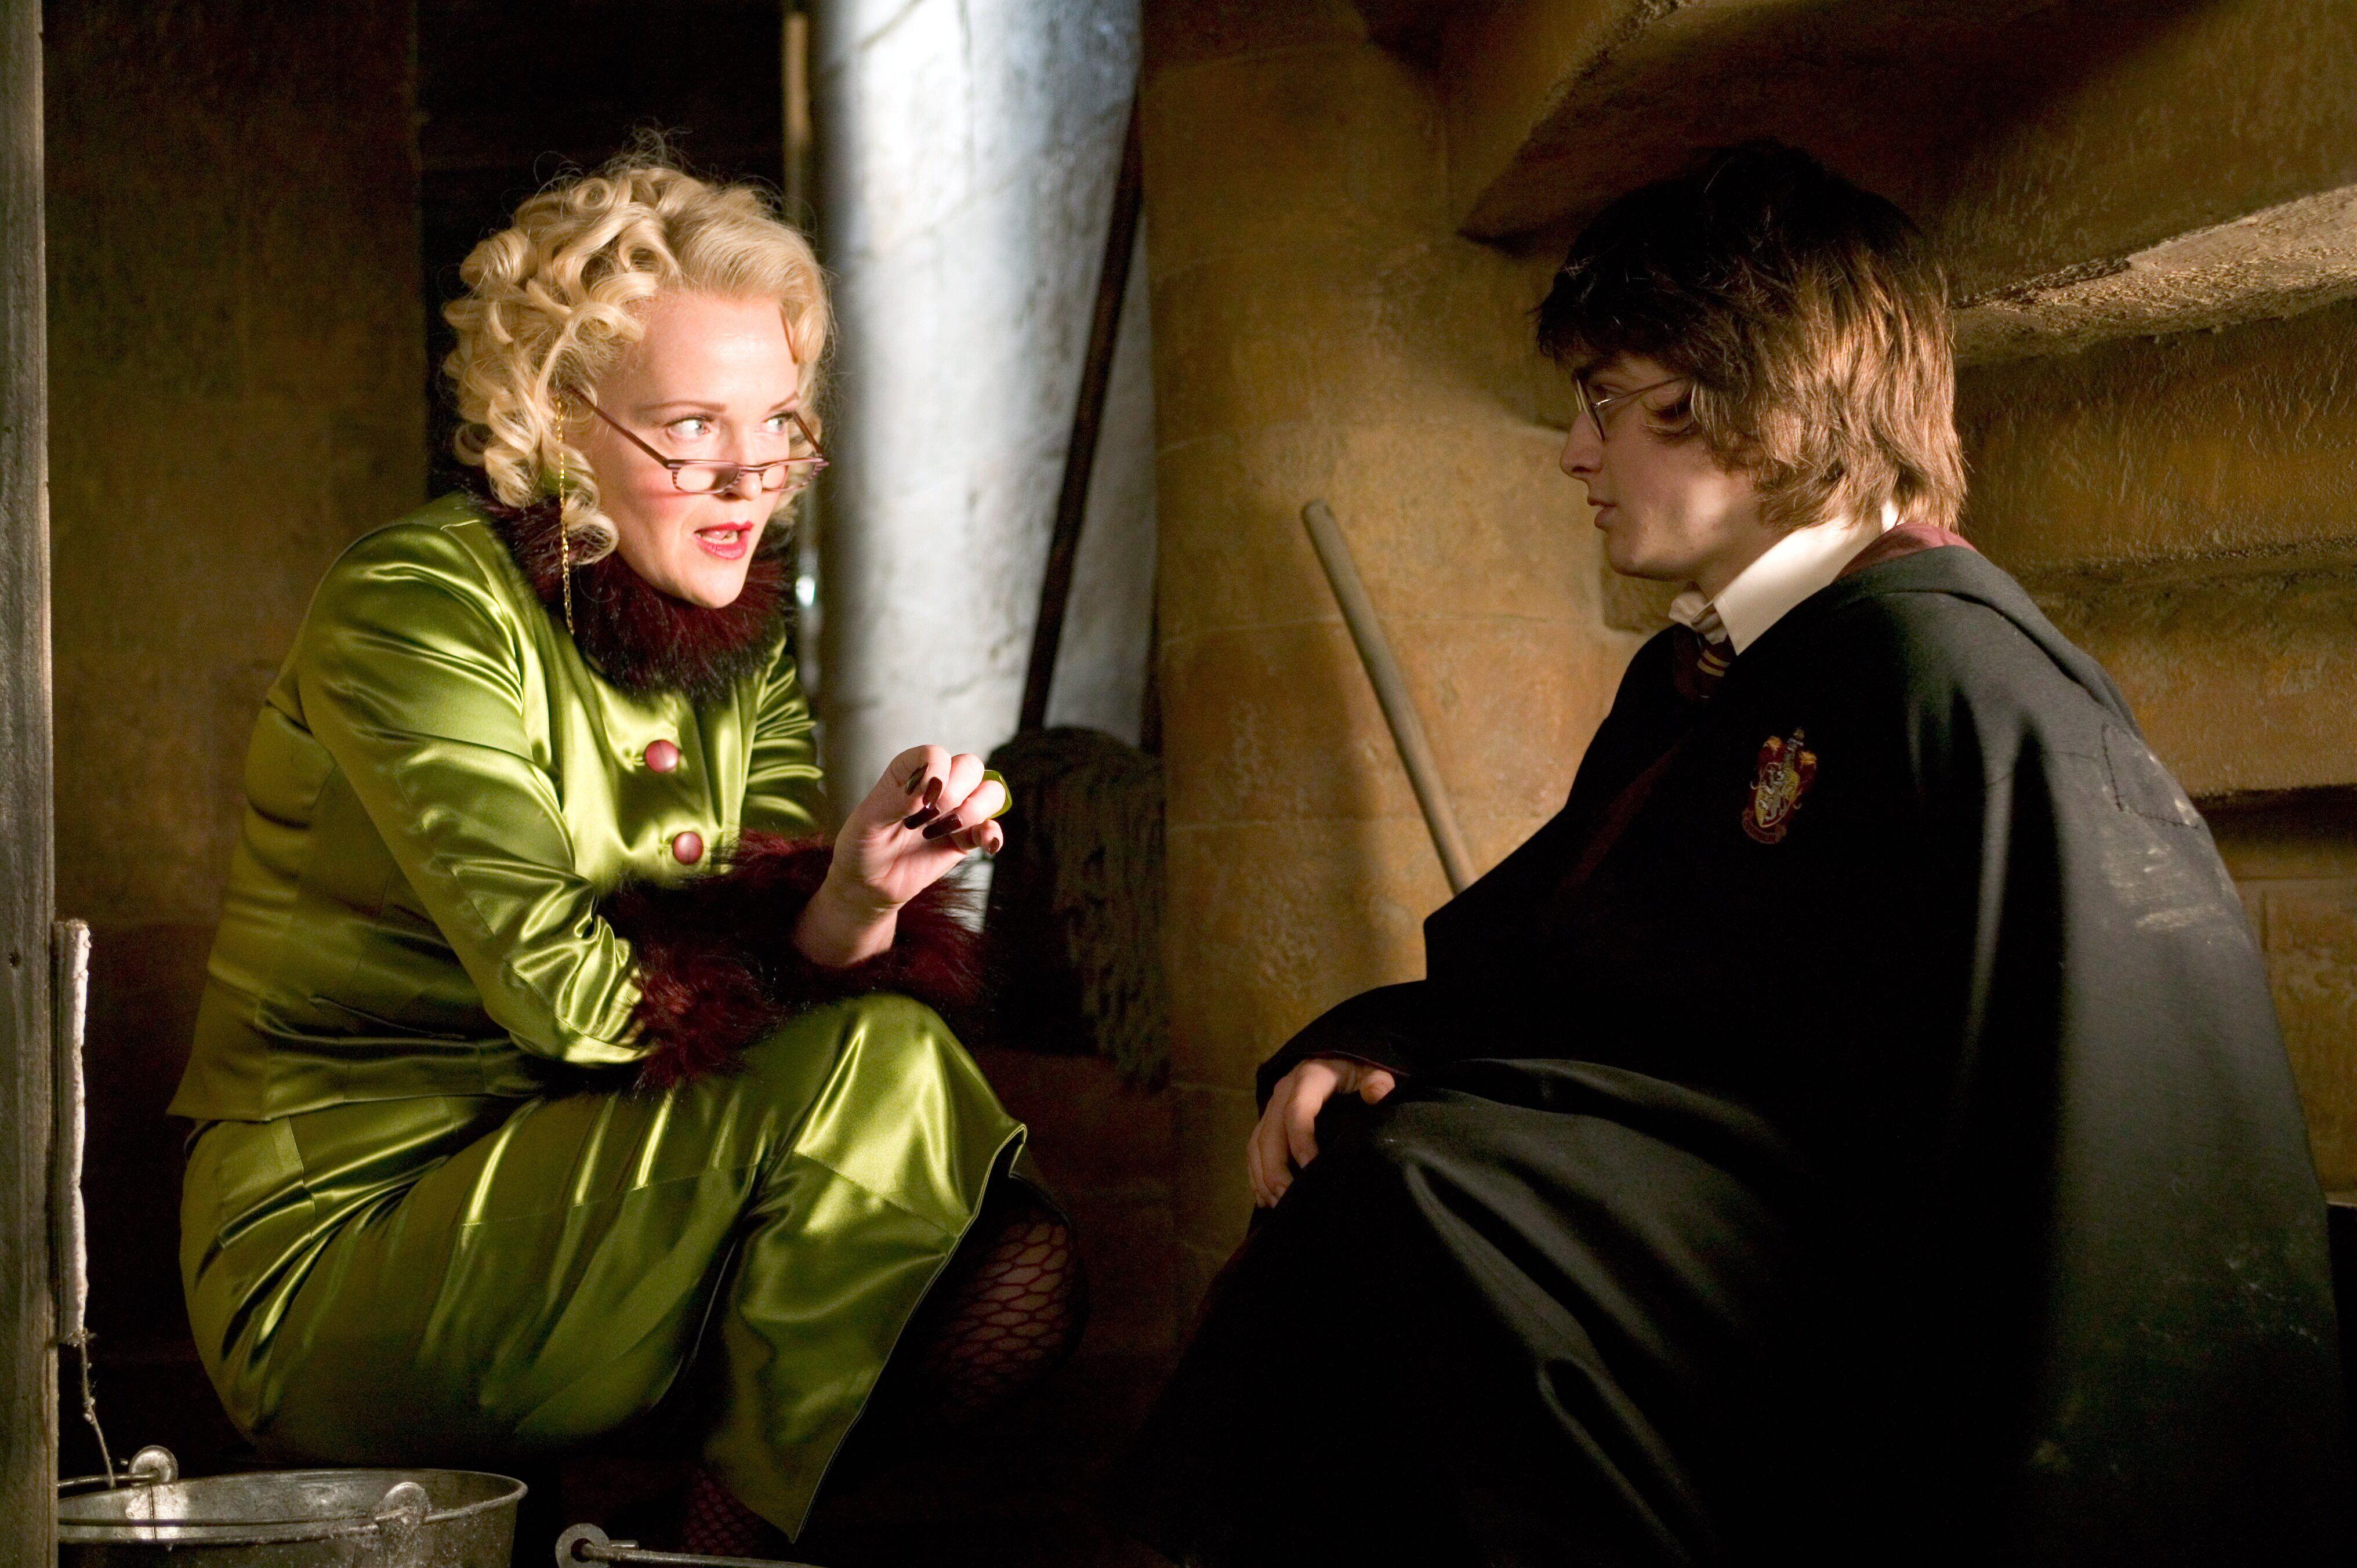 27 Jpg 4064 2704 Miranda Richardson Harry Potter Wiki Harry Potter Characters